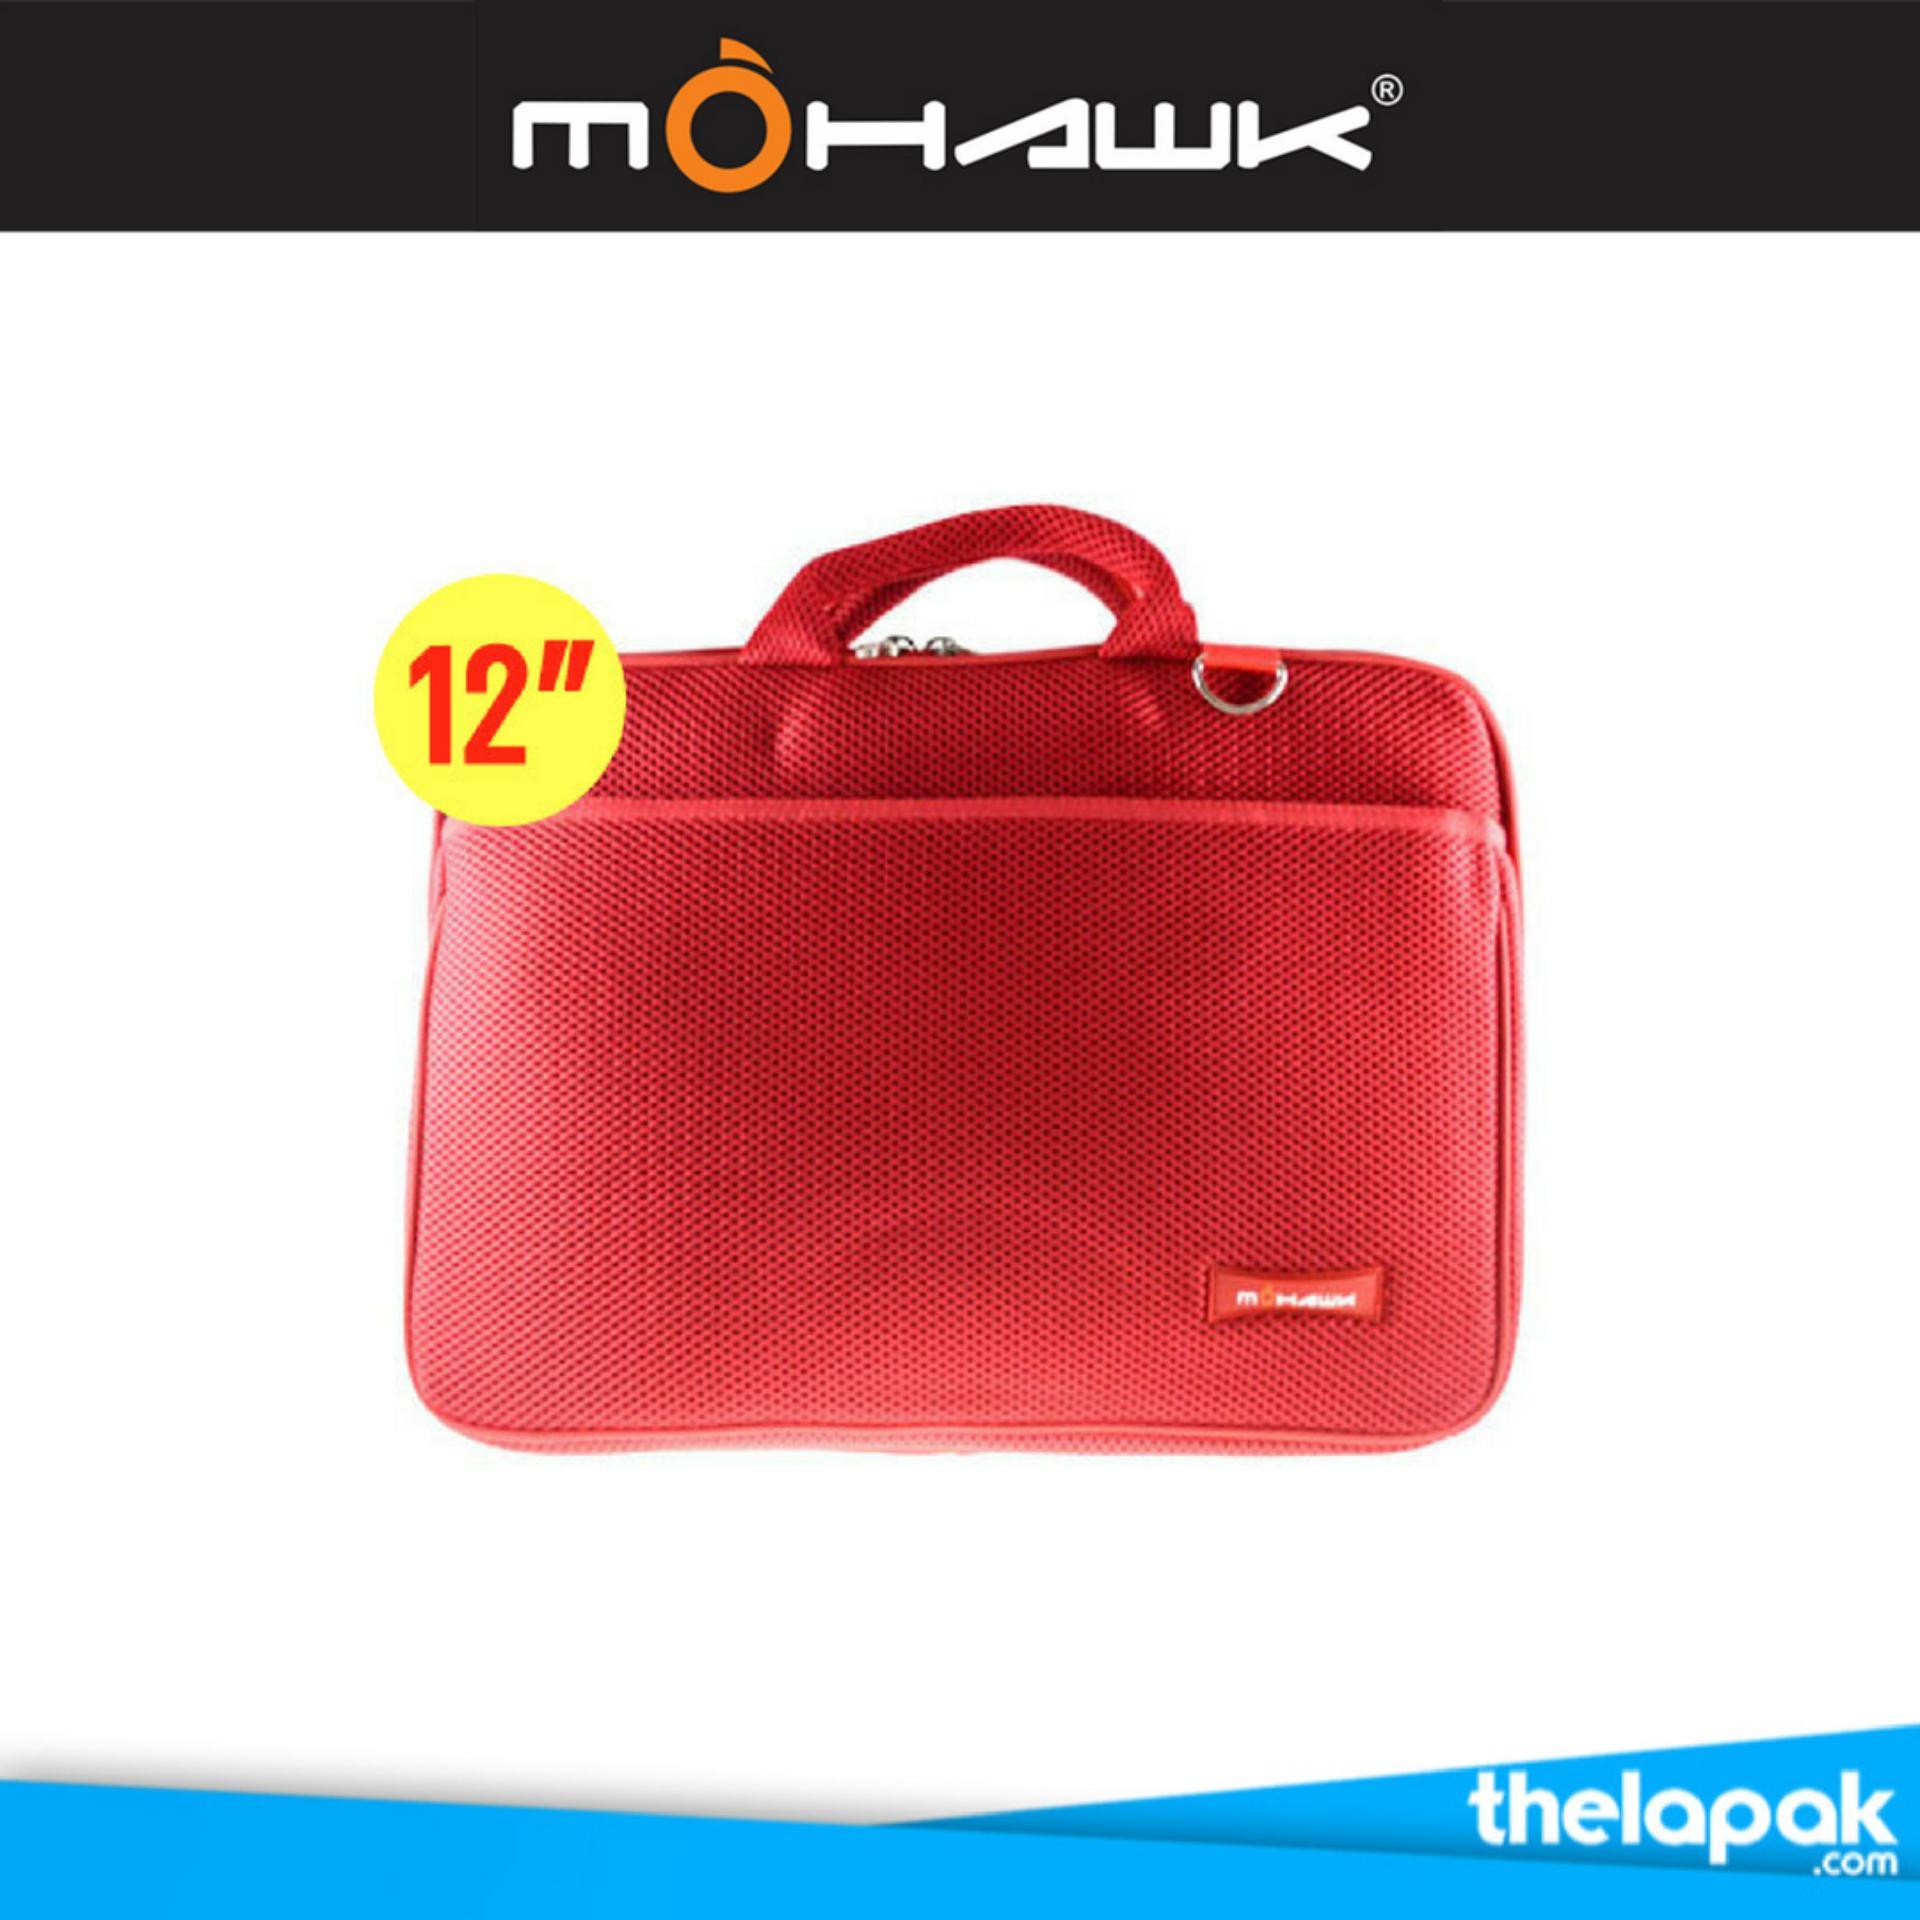 Penawaran Istimewa Mohawk Notebook Softcase 3008 12 Polos Merah Terbaru